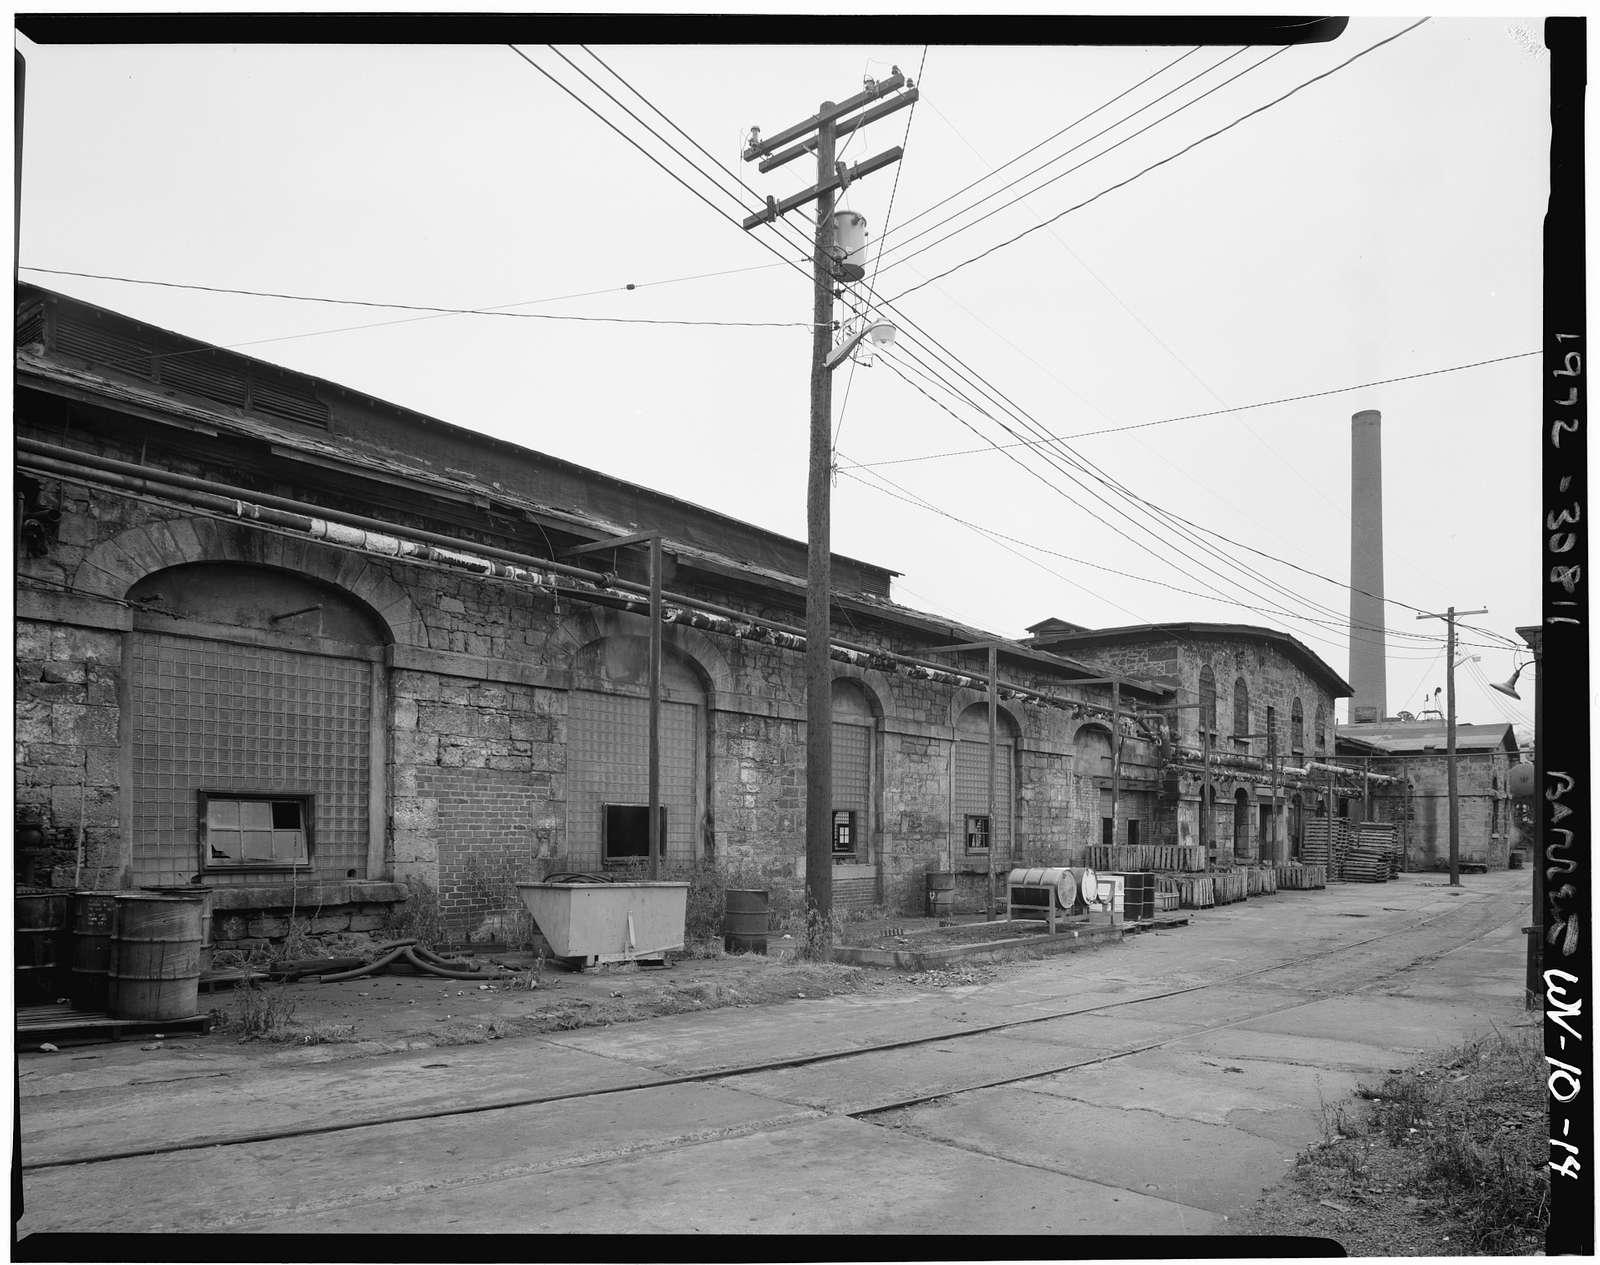 Northwestern Virginia (B&O) Railroad, Grafton Machine Shop & Foundry, U.S. 119 East of Tygart Valley River, Grafton, Taylor County, WV